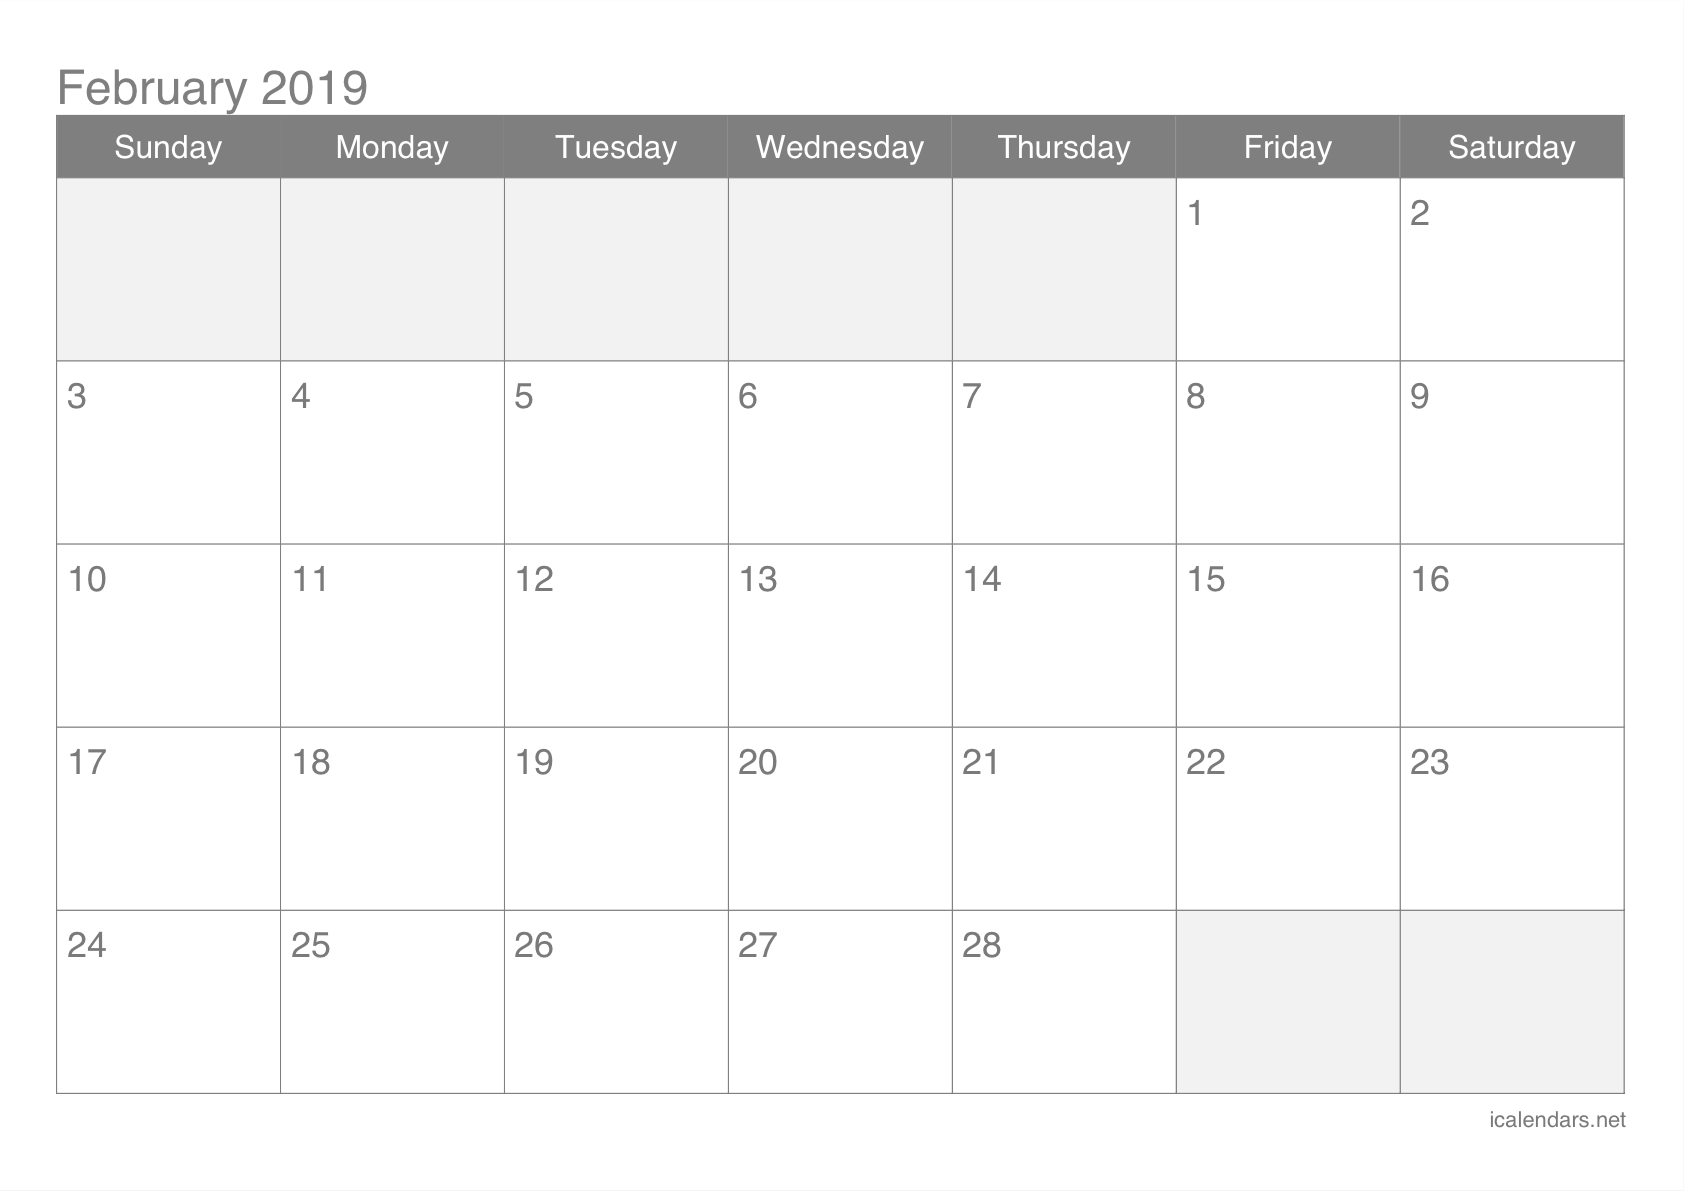 2019 February Printable Calendar